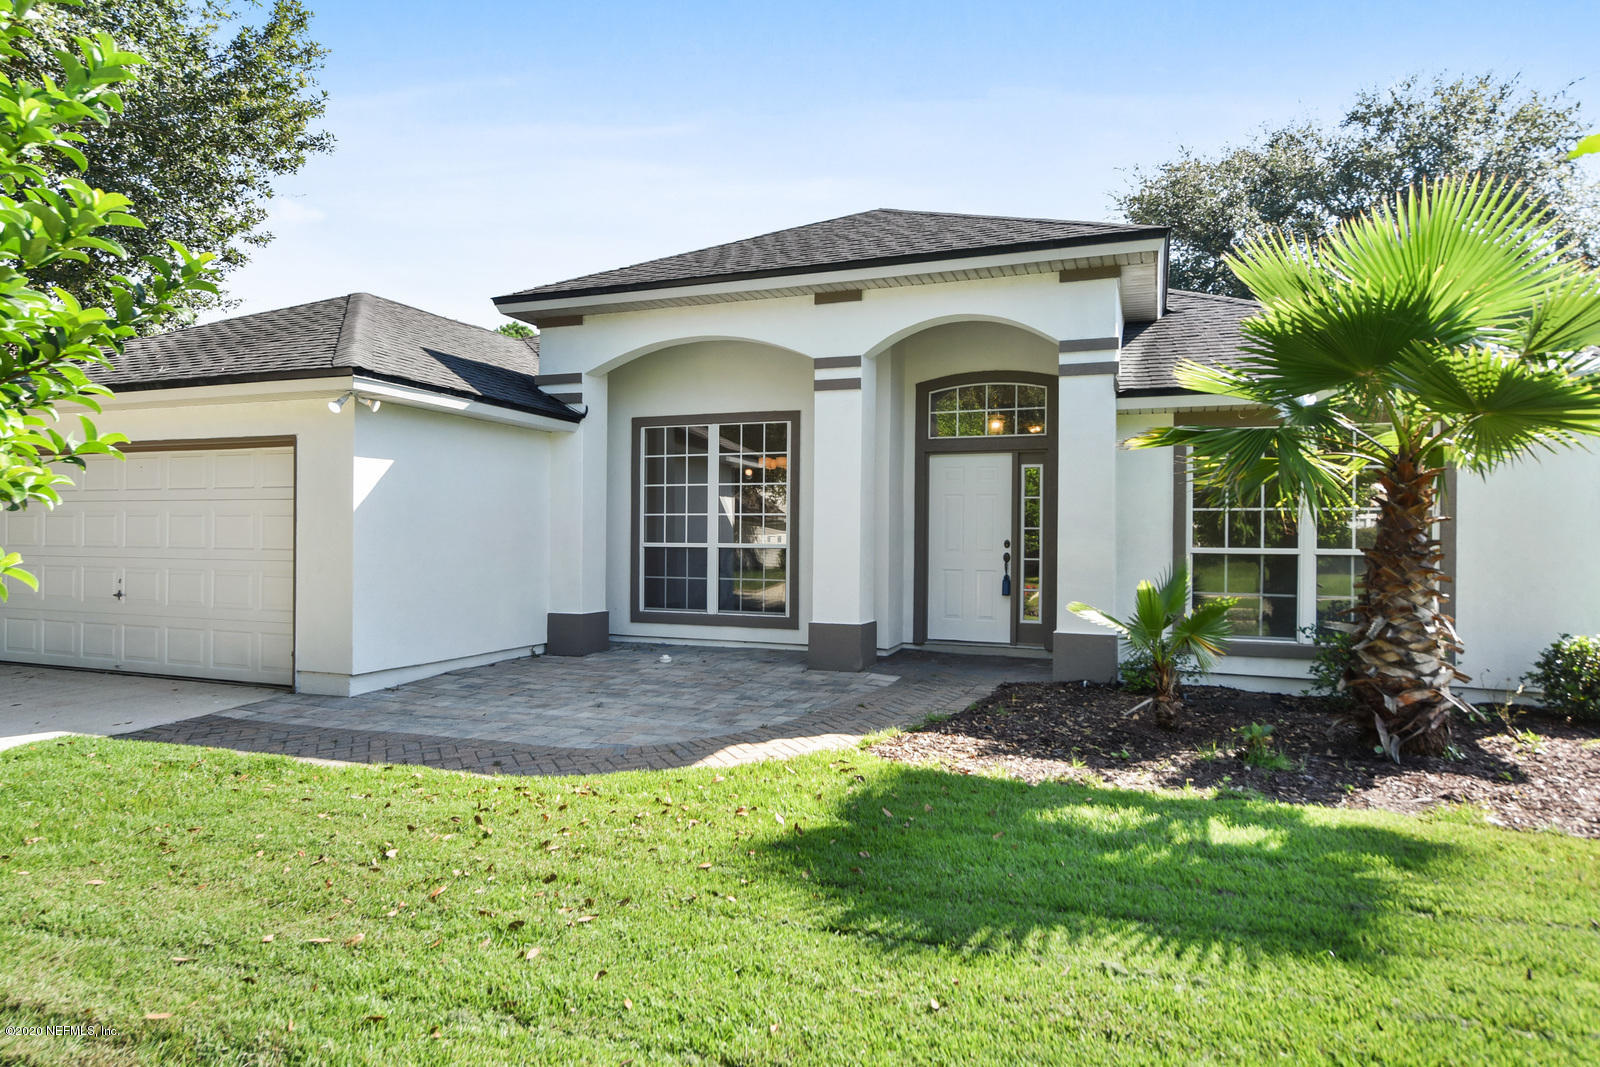 3515 LAUREL MILL, ORANGE PARK, FLORIDA 32065, 4 Bedrooms Bedrooms, ,2 BathroomsBathrooms,Residential,For sale,LAUREL MILL,1061081